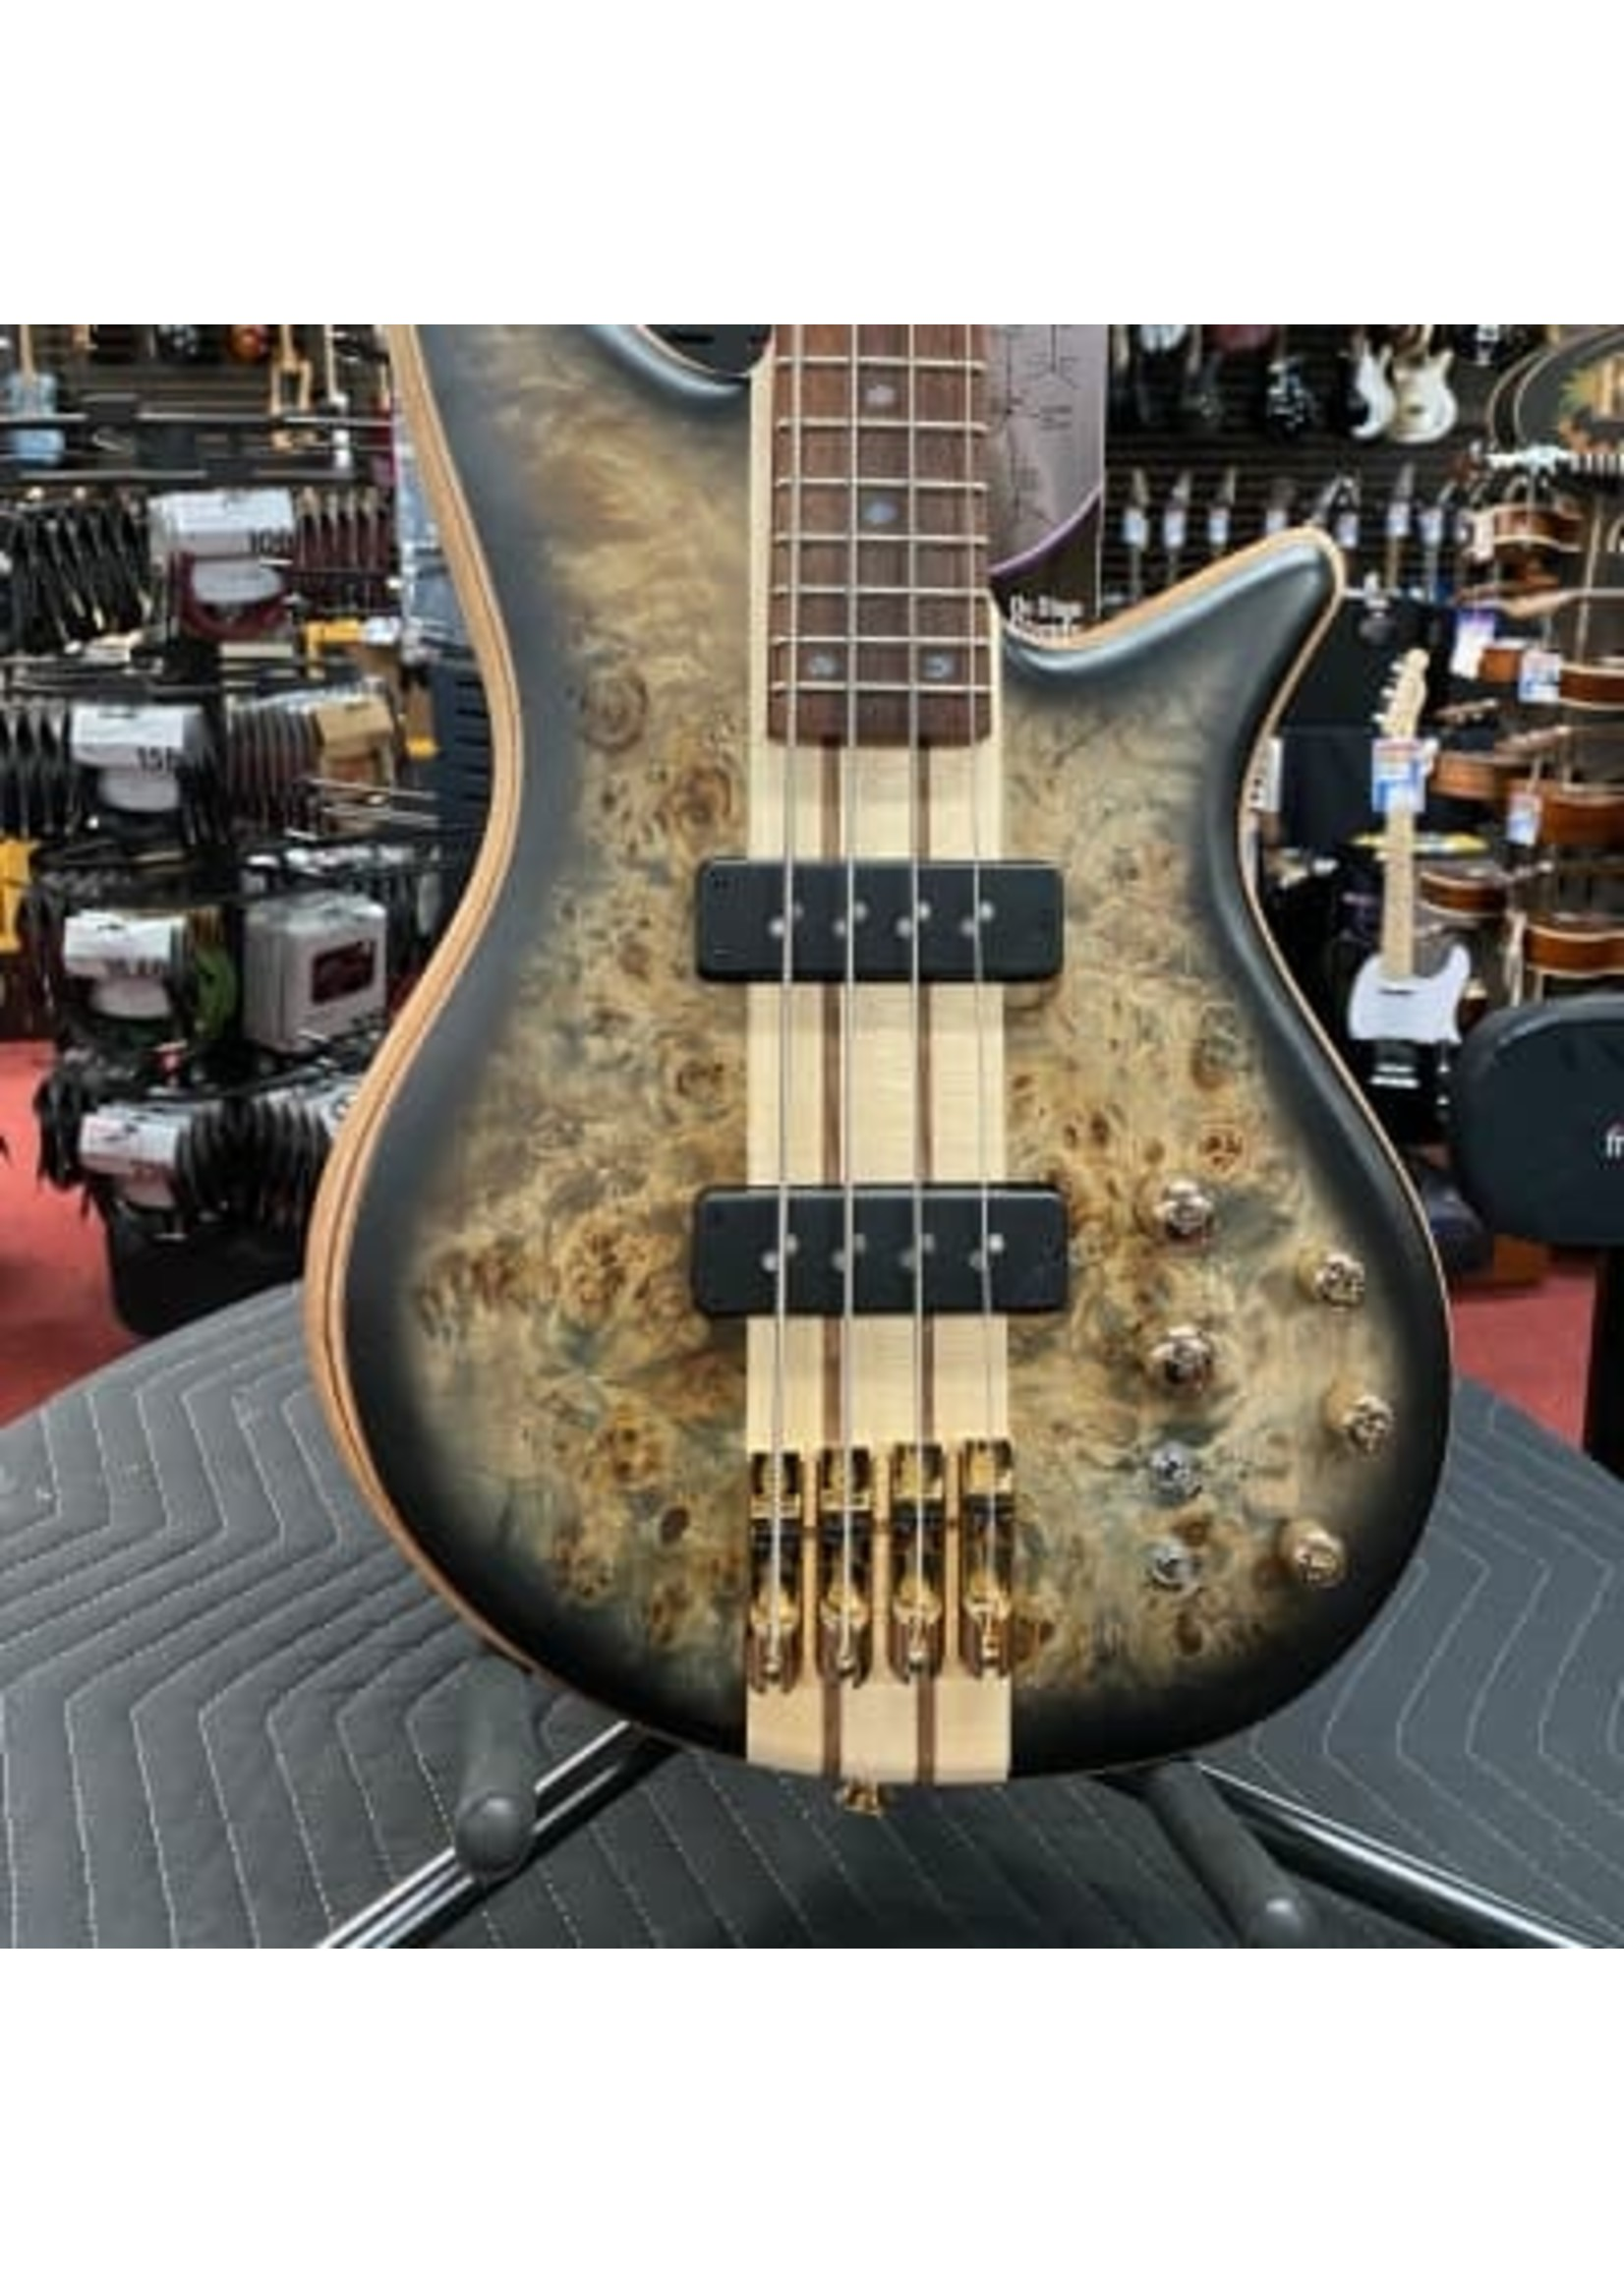 Jackson Jackson Pro Series Spectra Bass SBP IV, Caramelized Jatoba Fingerboard, Transparent Black Burst